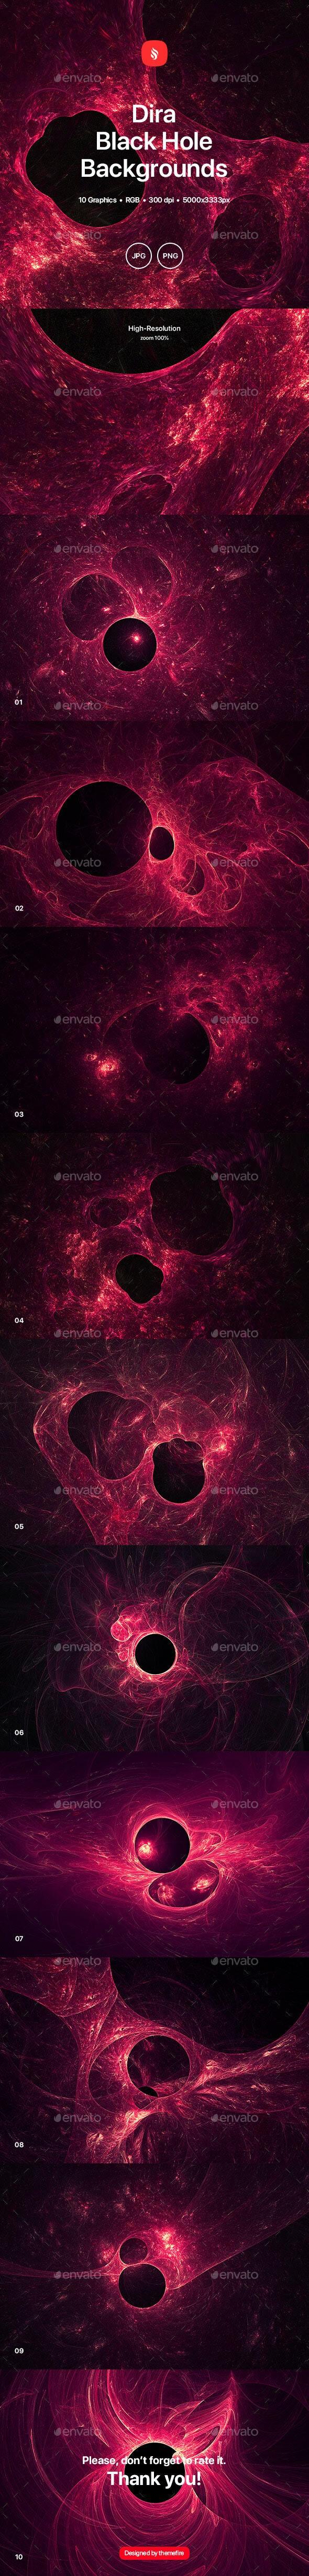 Dira - Black Hole Backgrounds - Tech / Futuristic Backgrounds